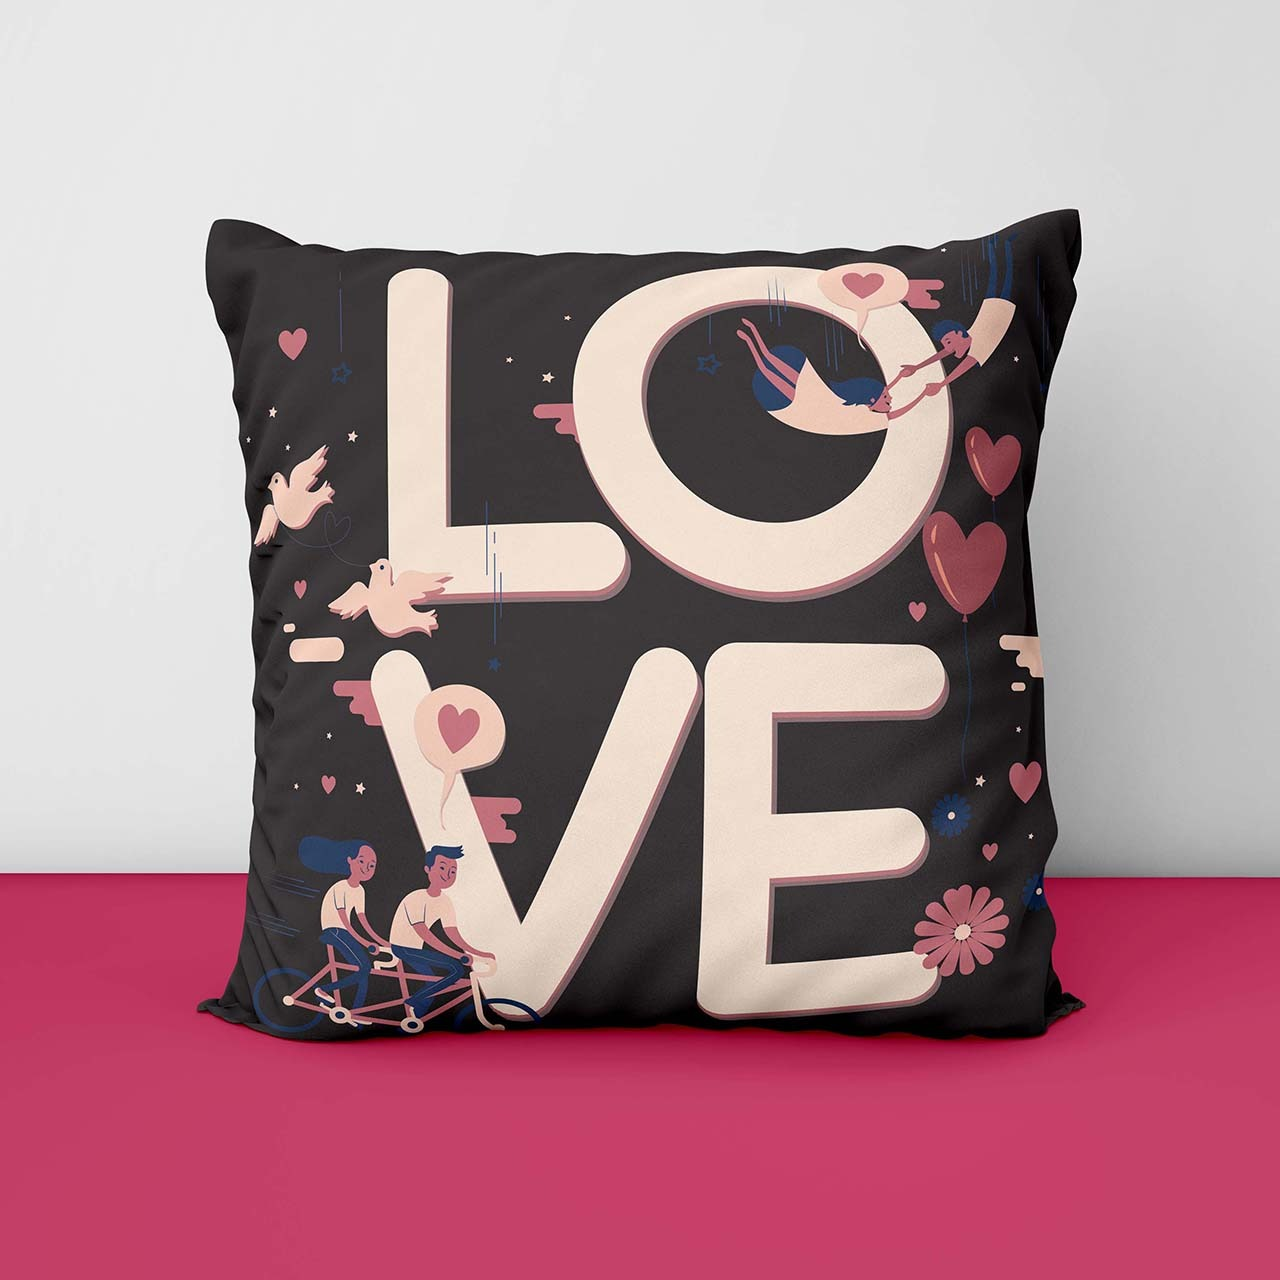 Love Printed Customize Cushion